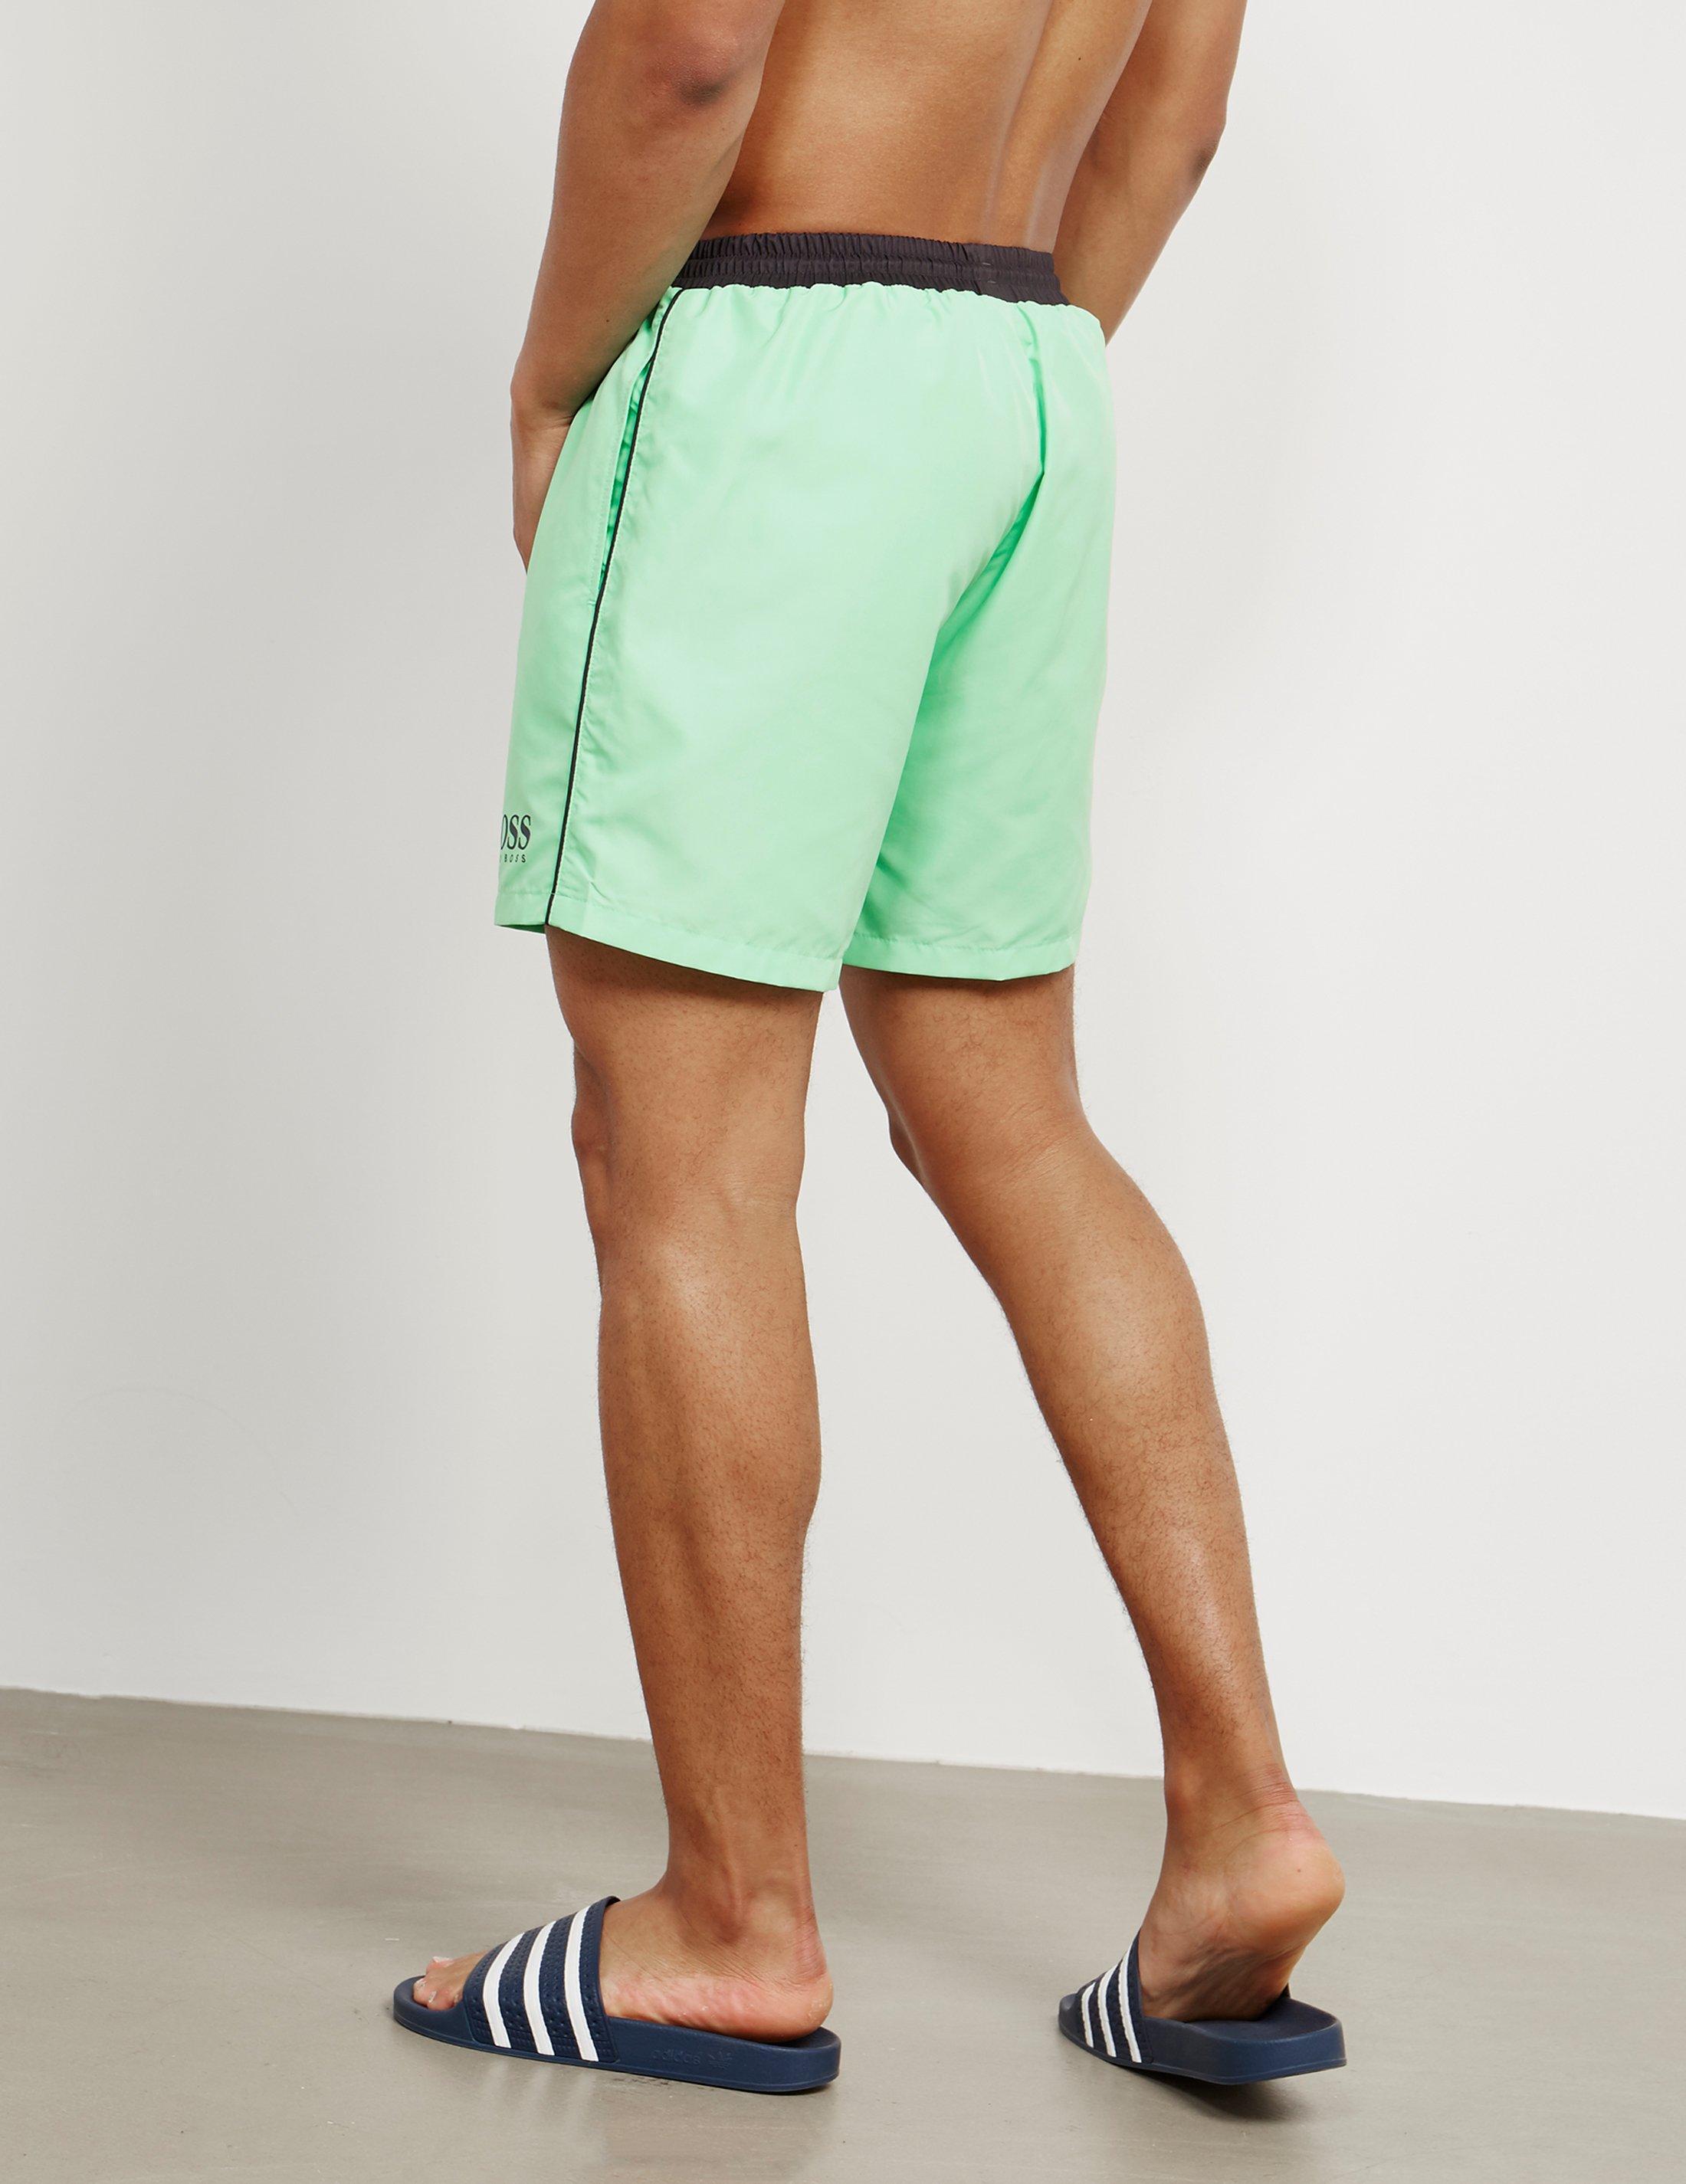 6f45ec5ed8 BOSS Mens Starfish Swim Shorts Green in Green for Men - Lyst